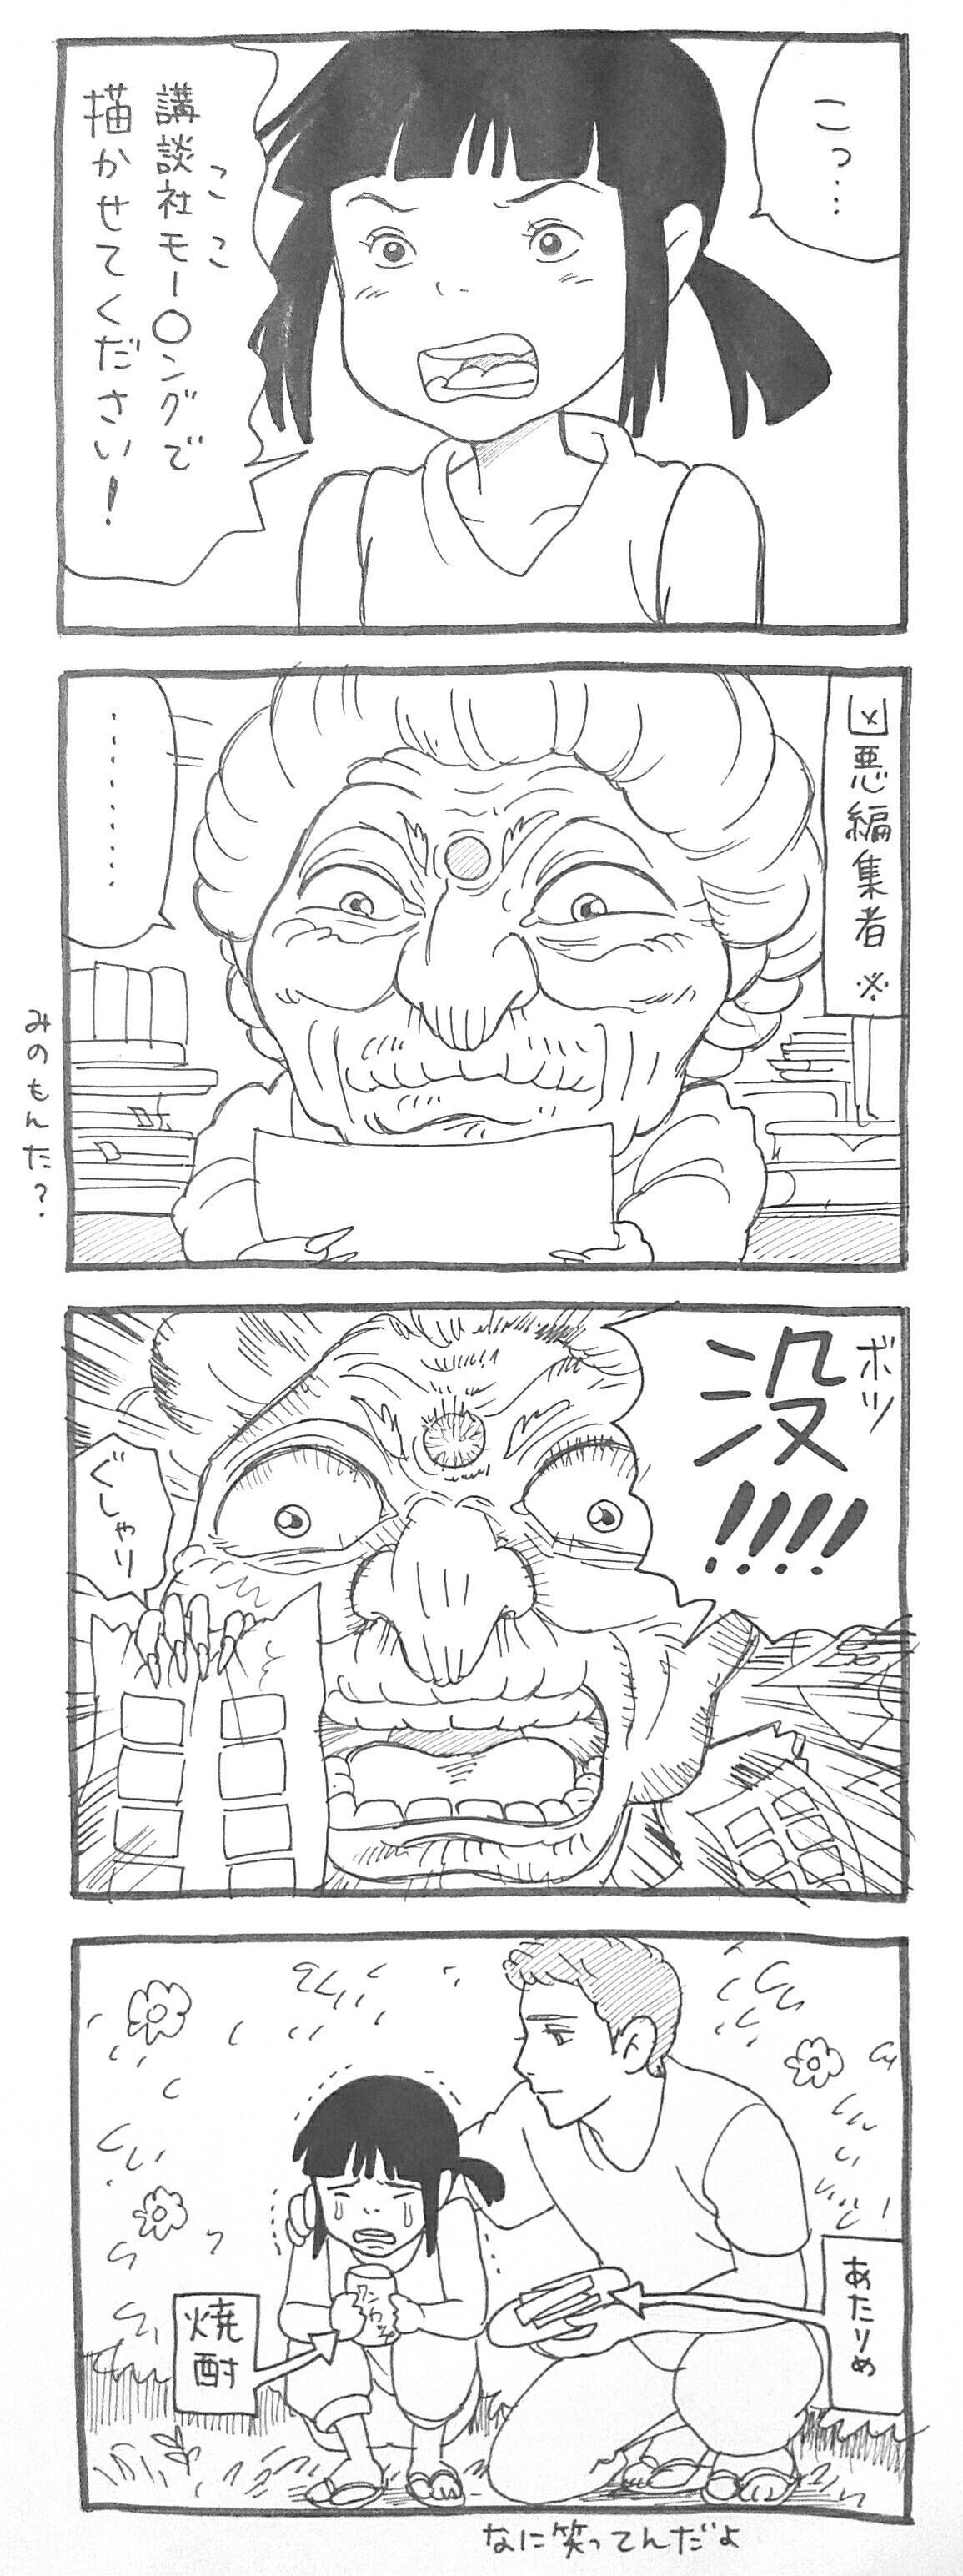 f:id:Shoko_drawing:20190817225624j:plain